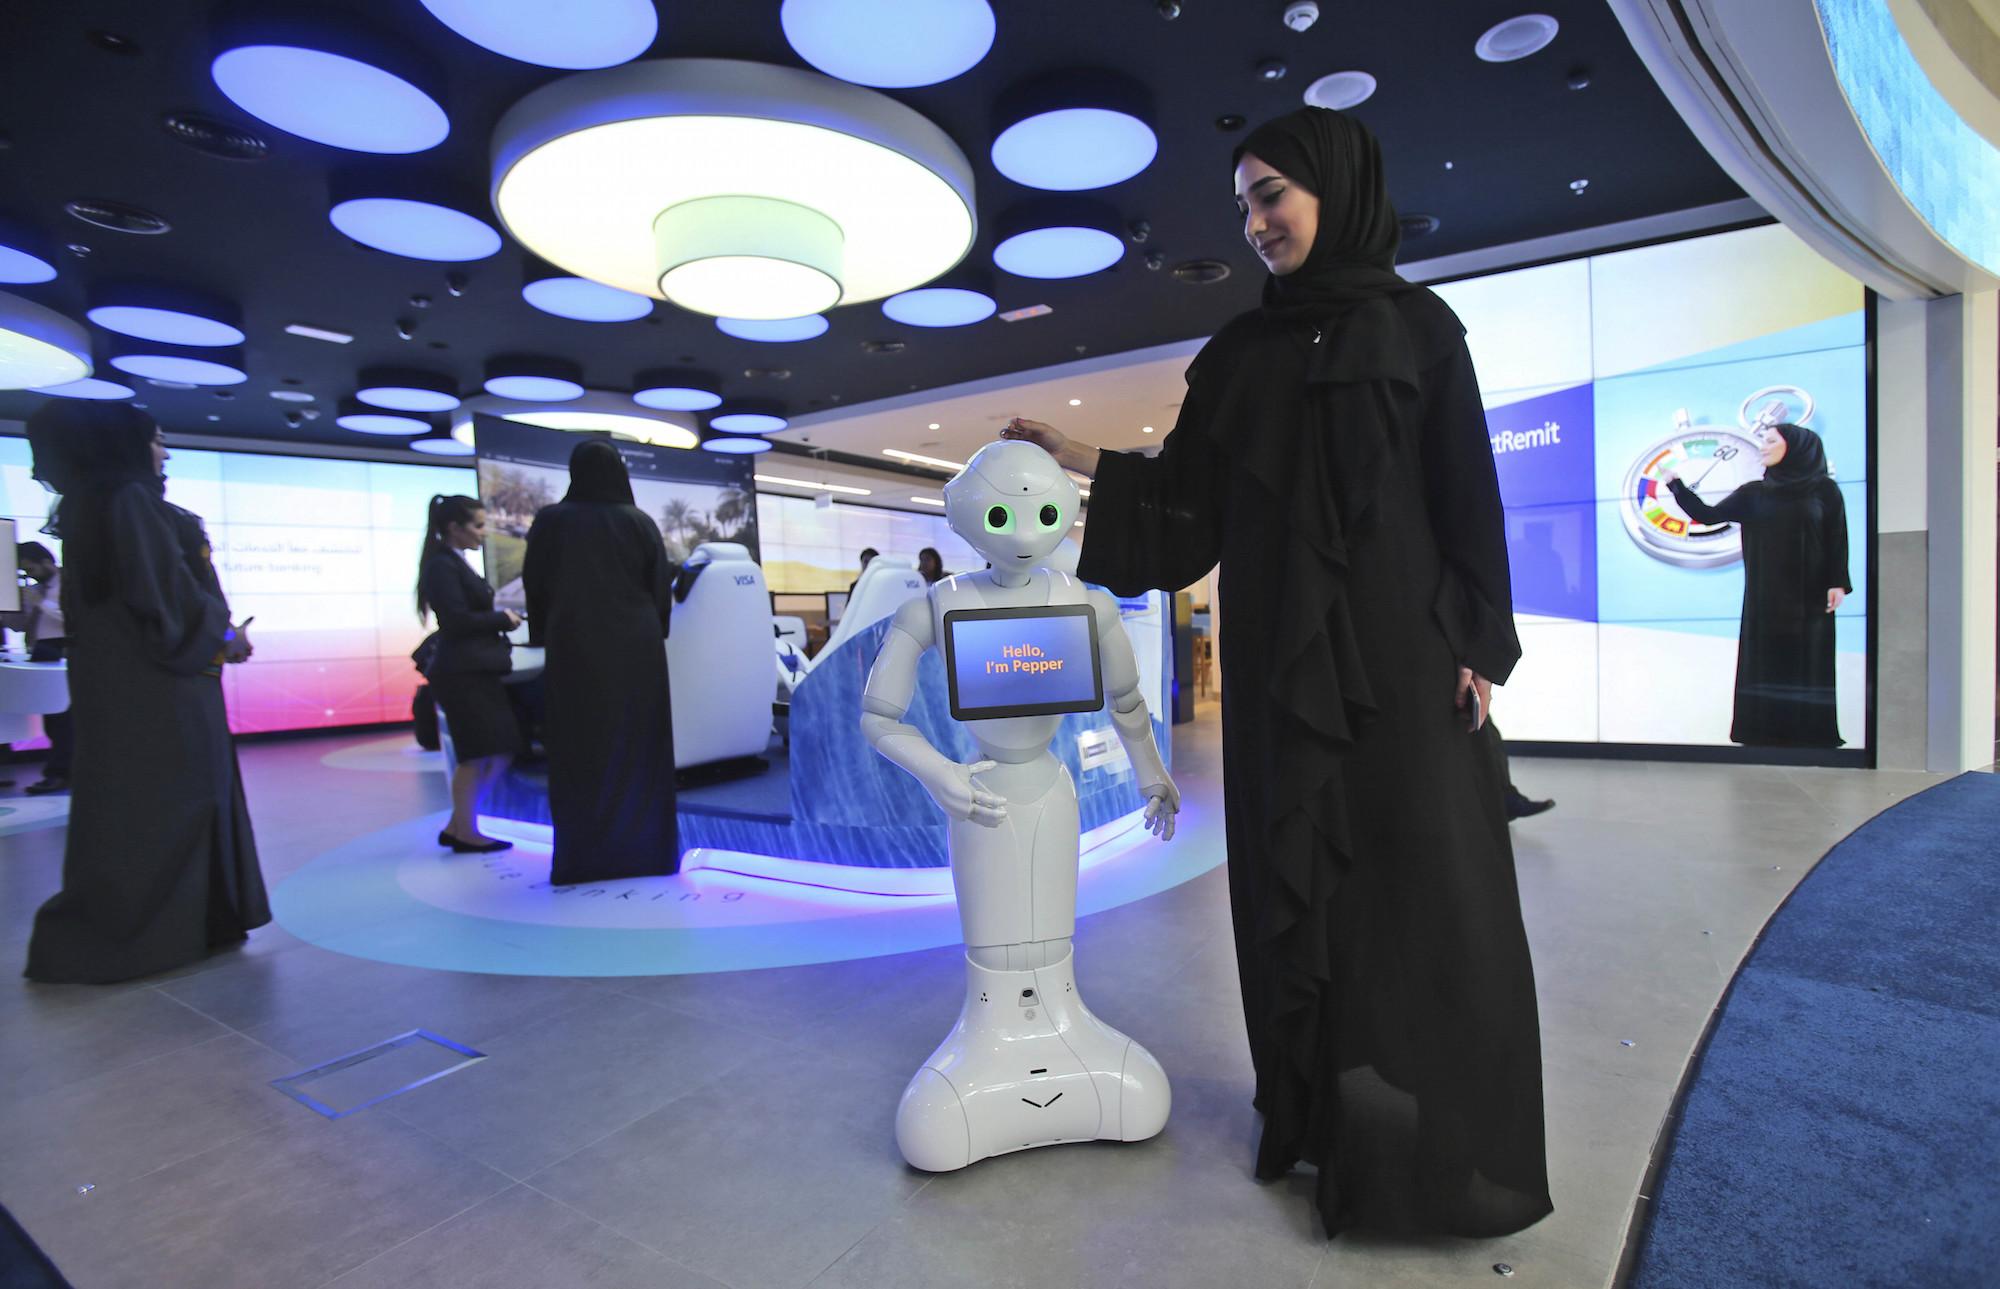 Emirati Woman Presents Pepper the Robot